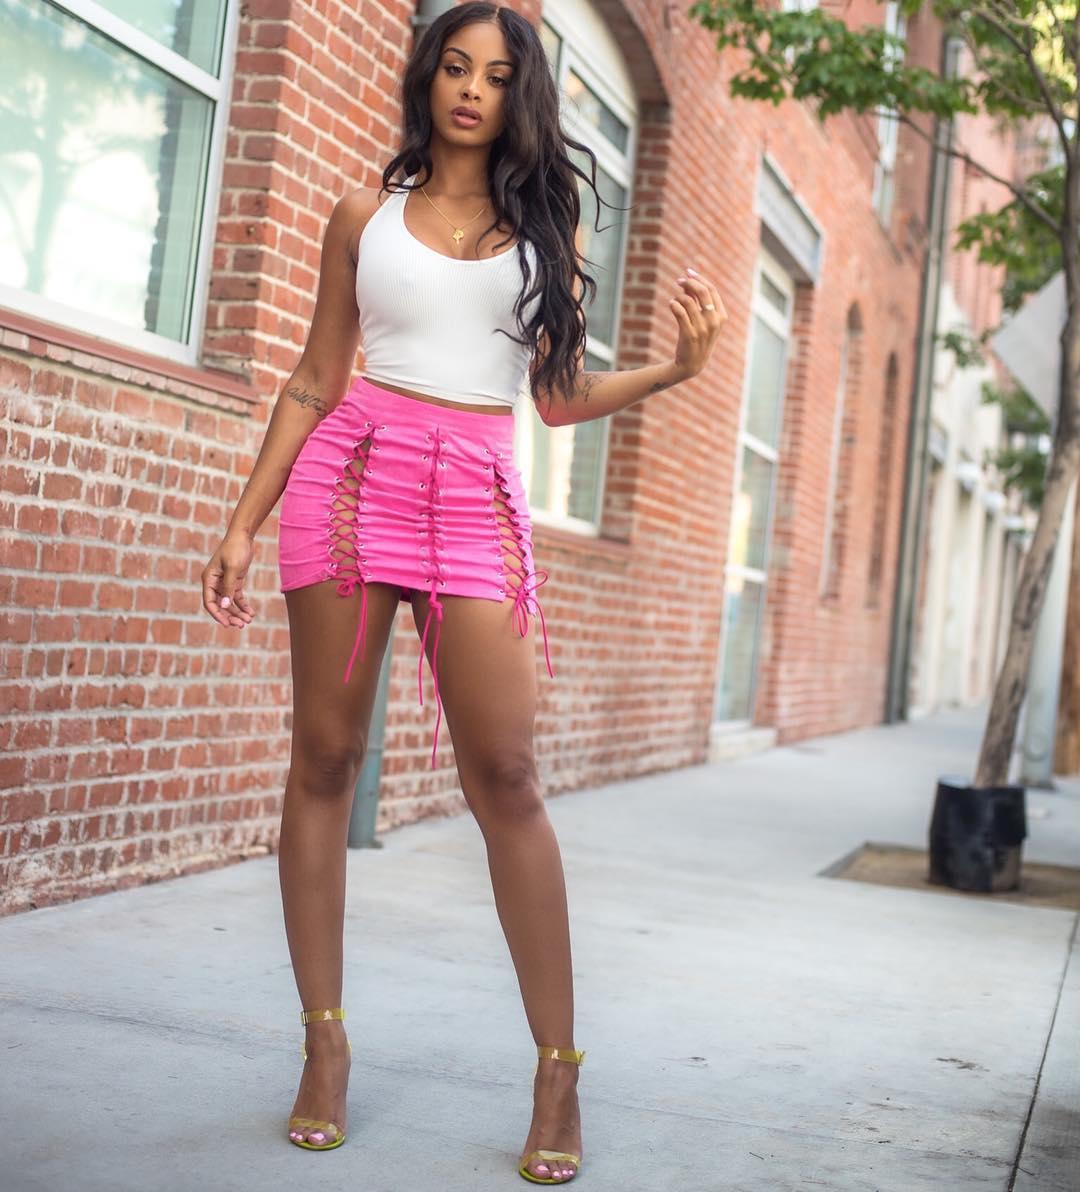 Ebony teen tightskirts